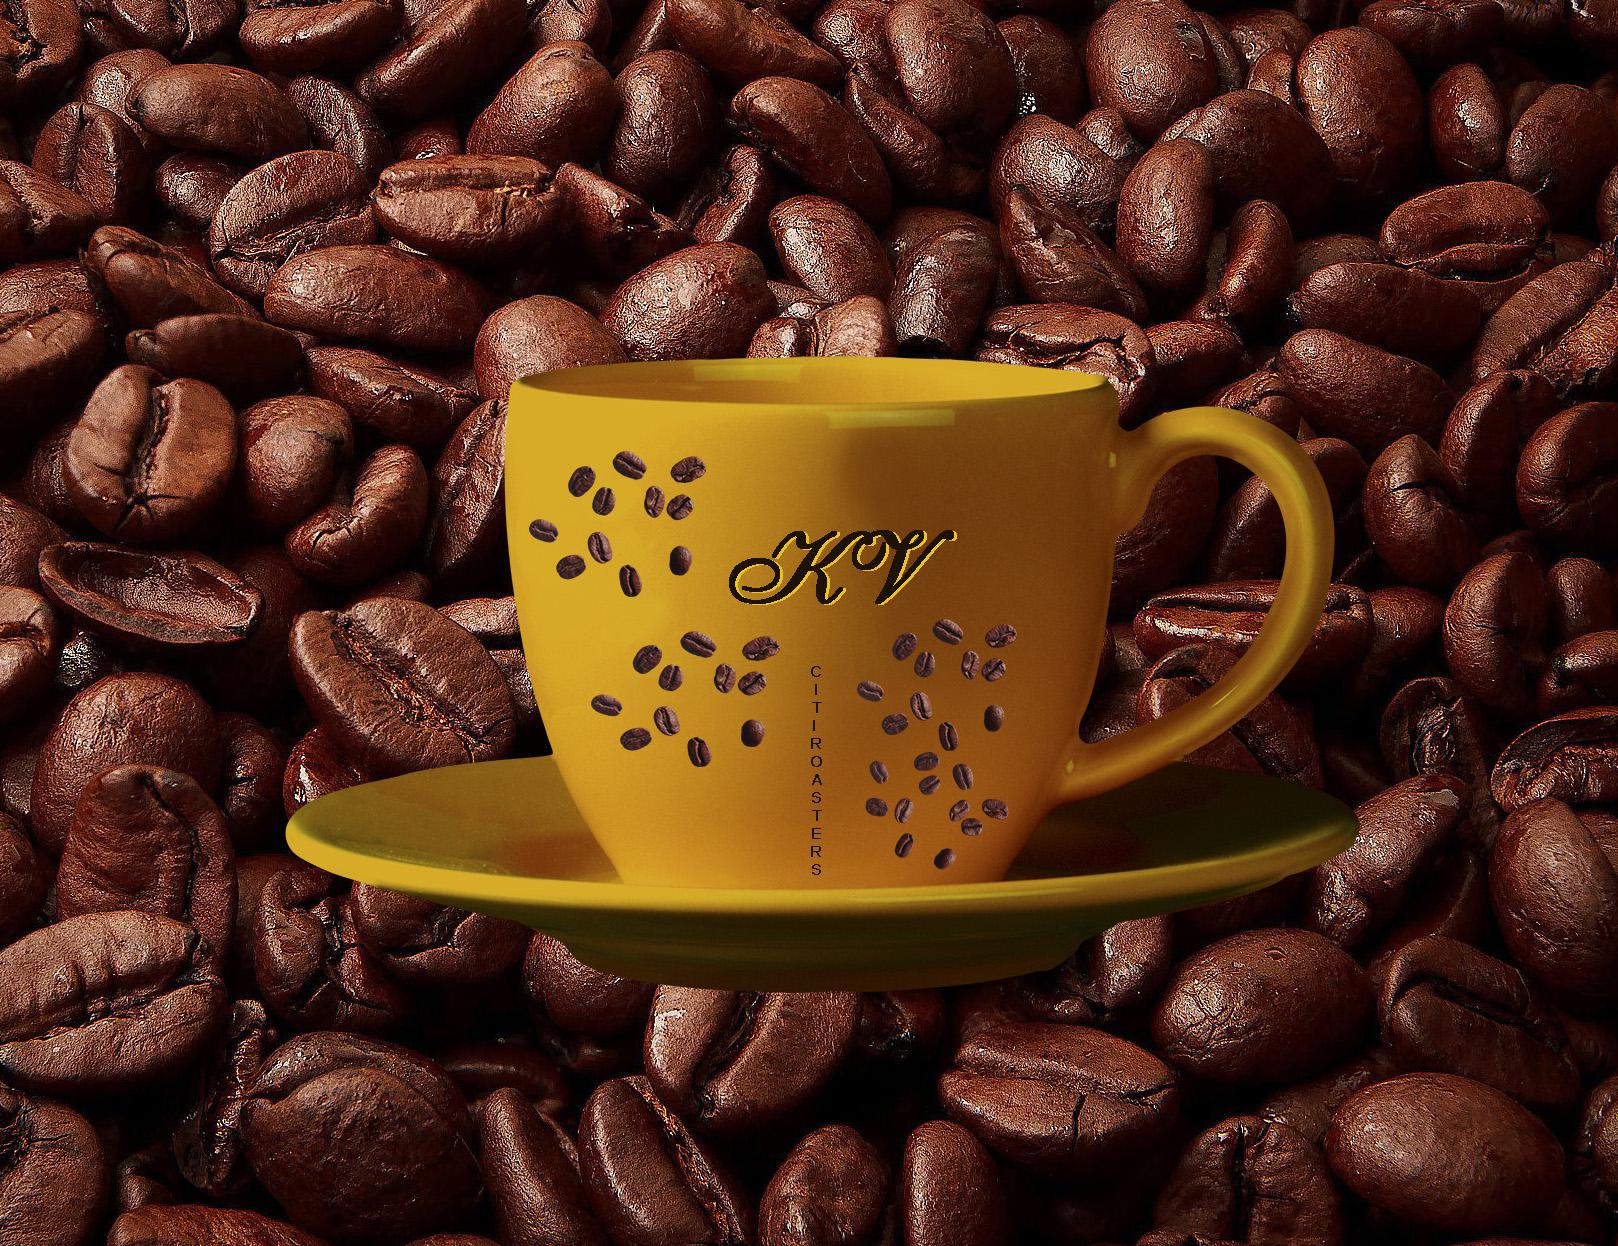 логотип для кофейной компании фото f_49654196bae9fbe1.jpg